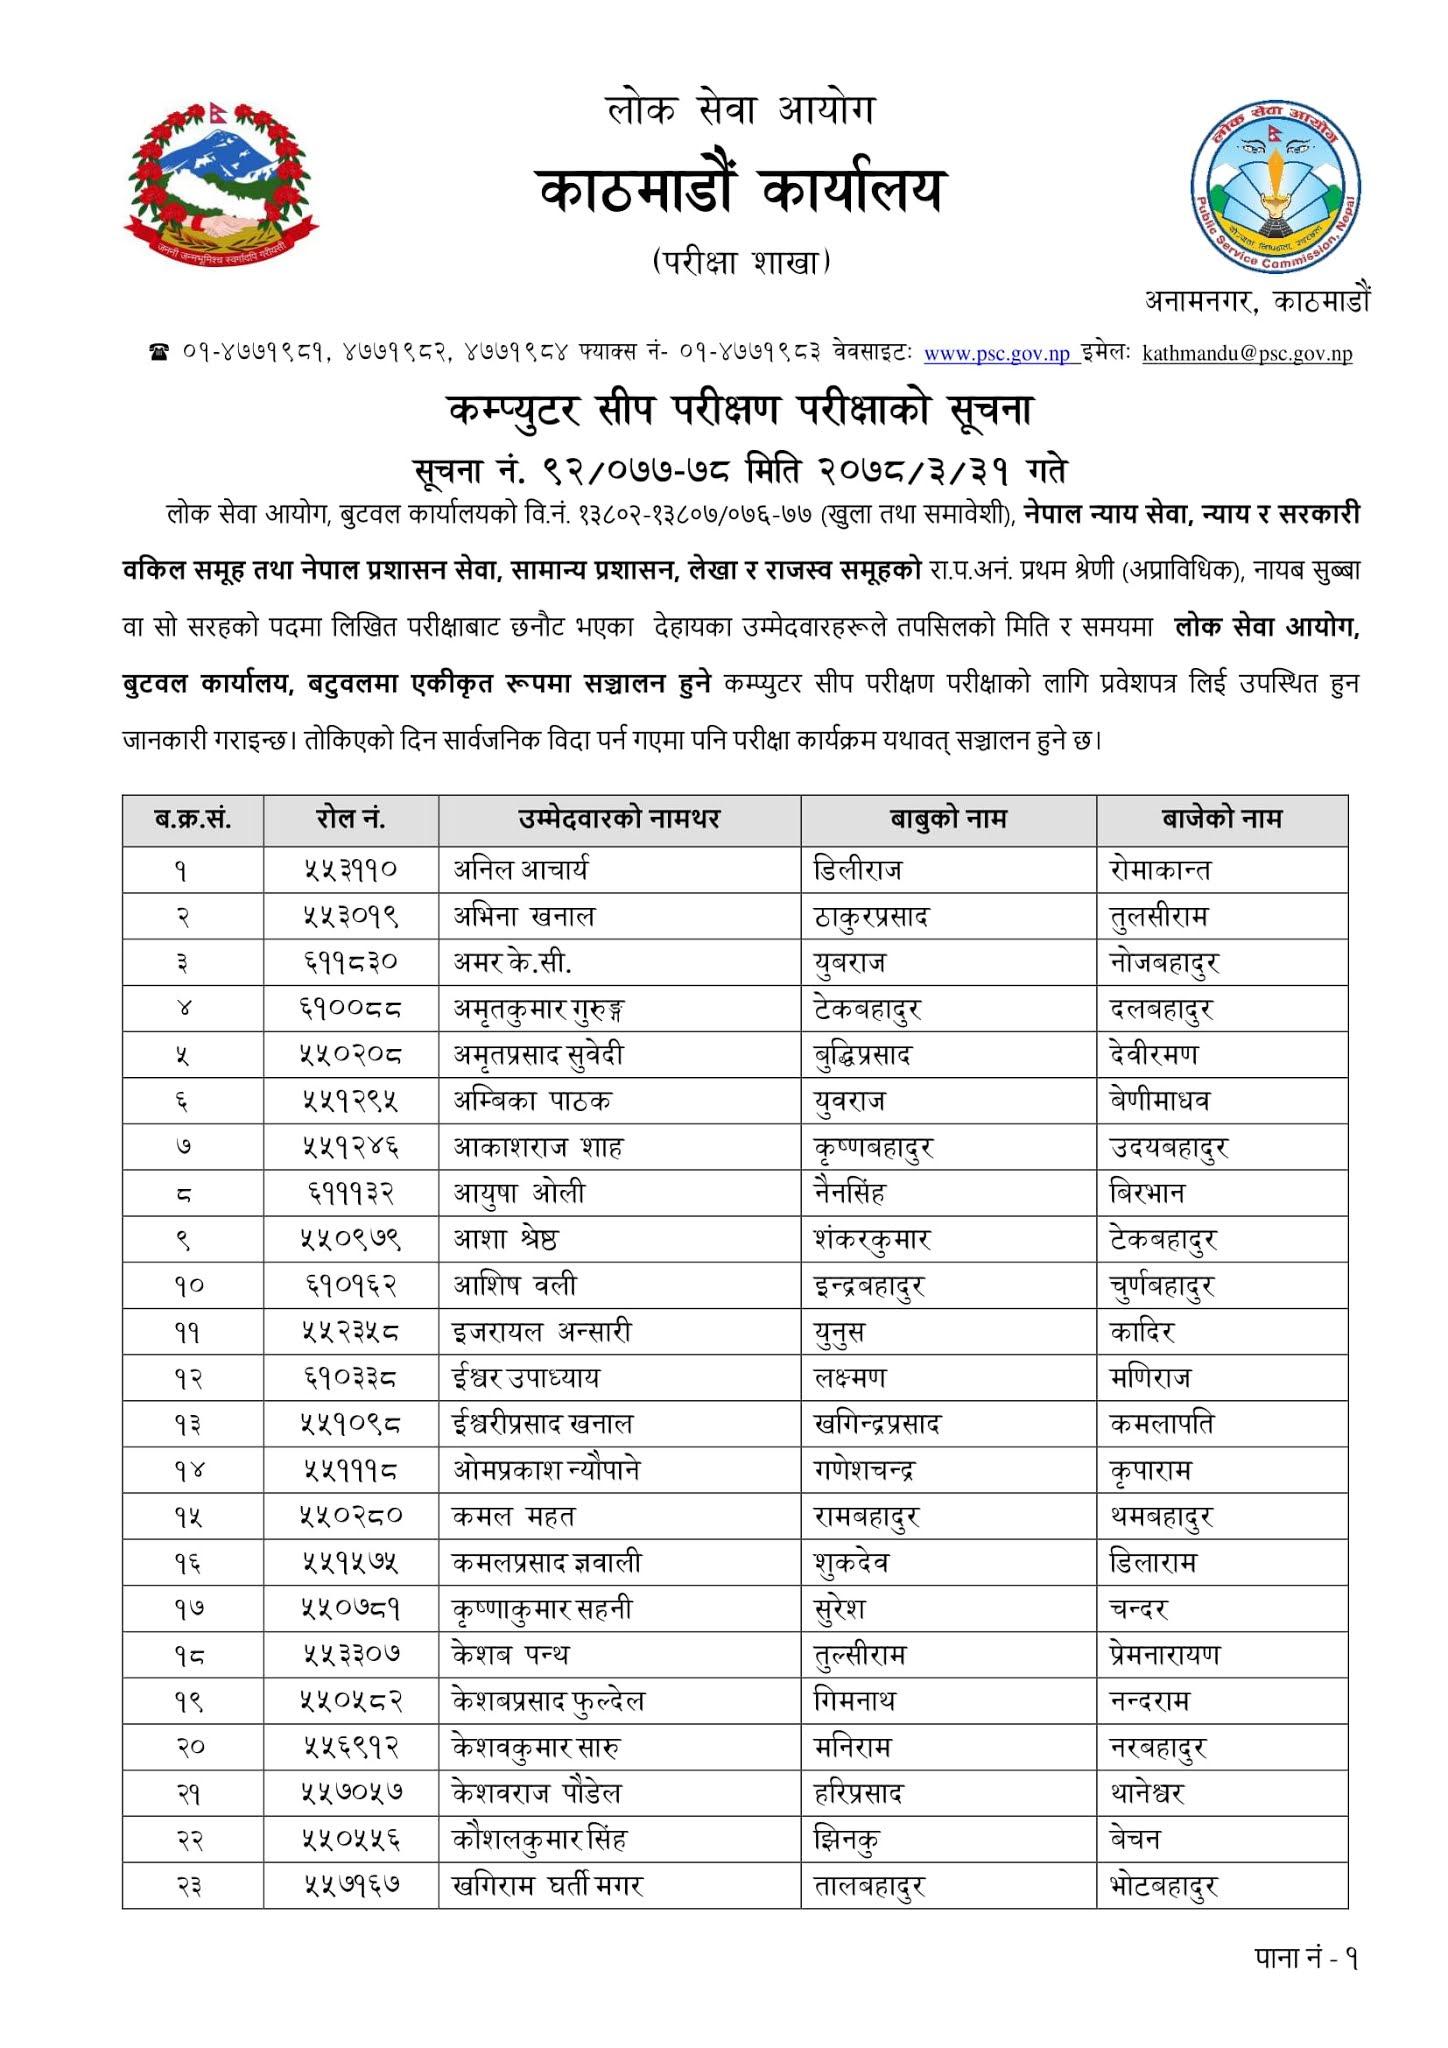 NASU - Butwal Lok Sewa Aayog Written Exam Result & Exam Schedule